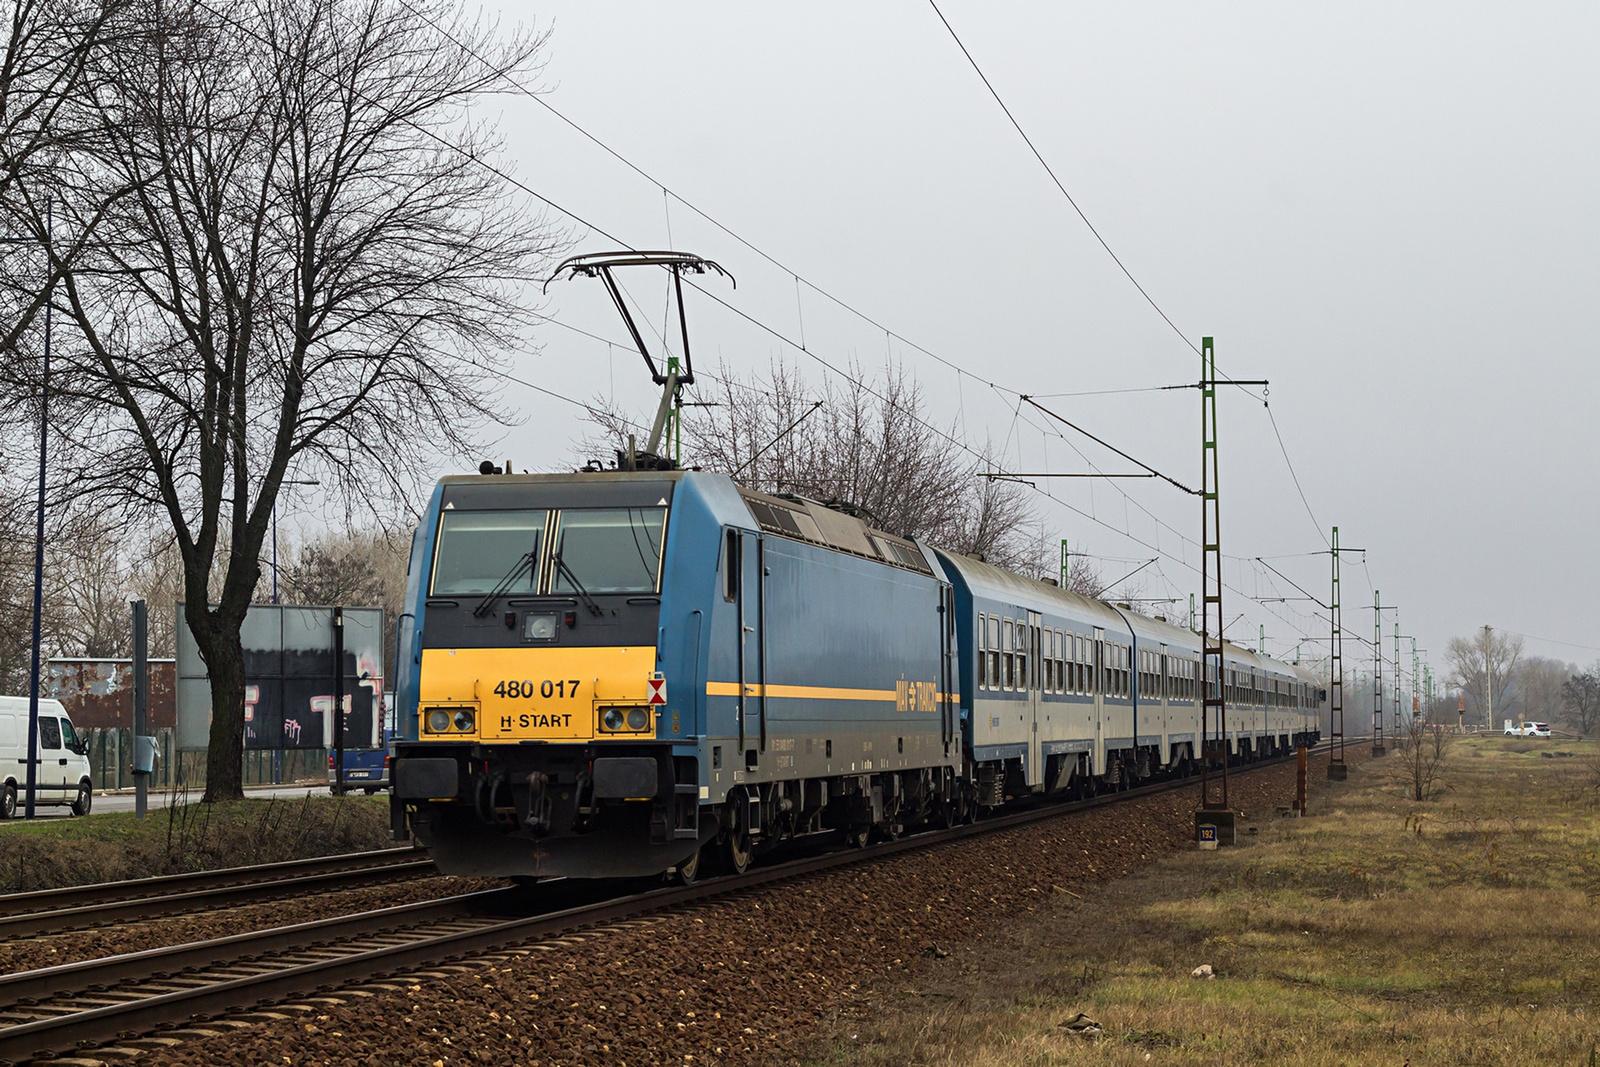 480 017 Ferihegy (2021.02.02)